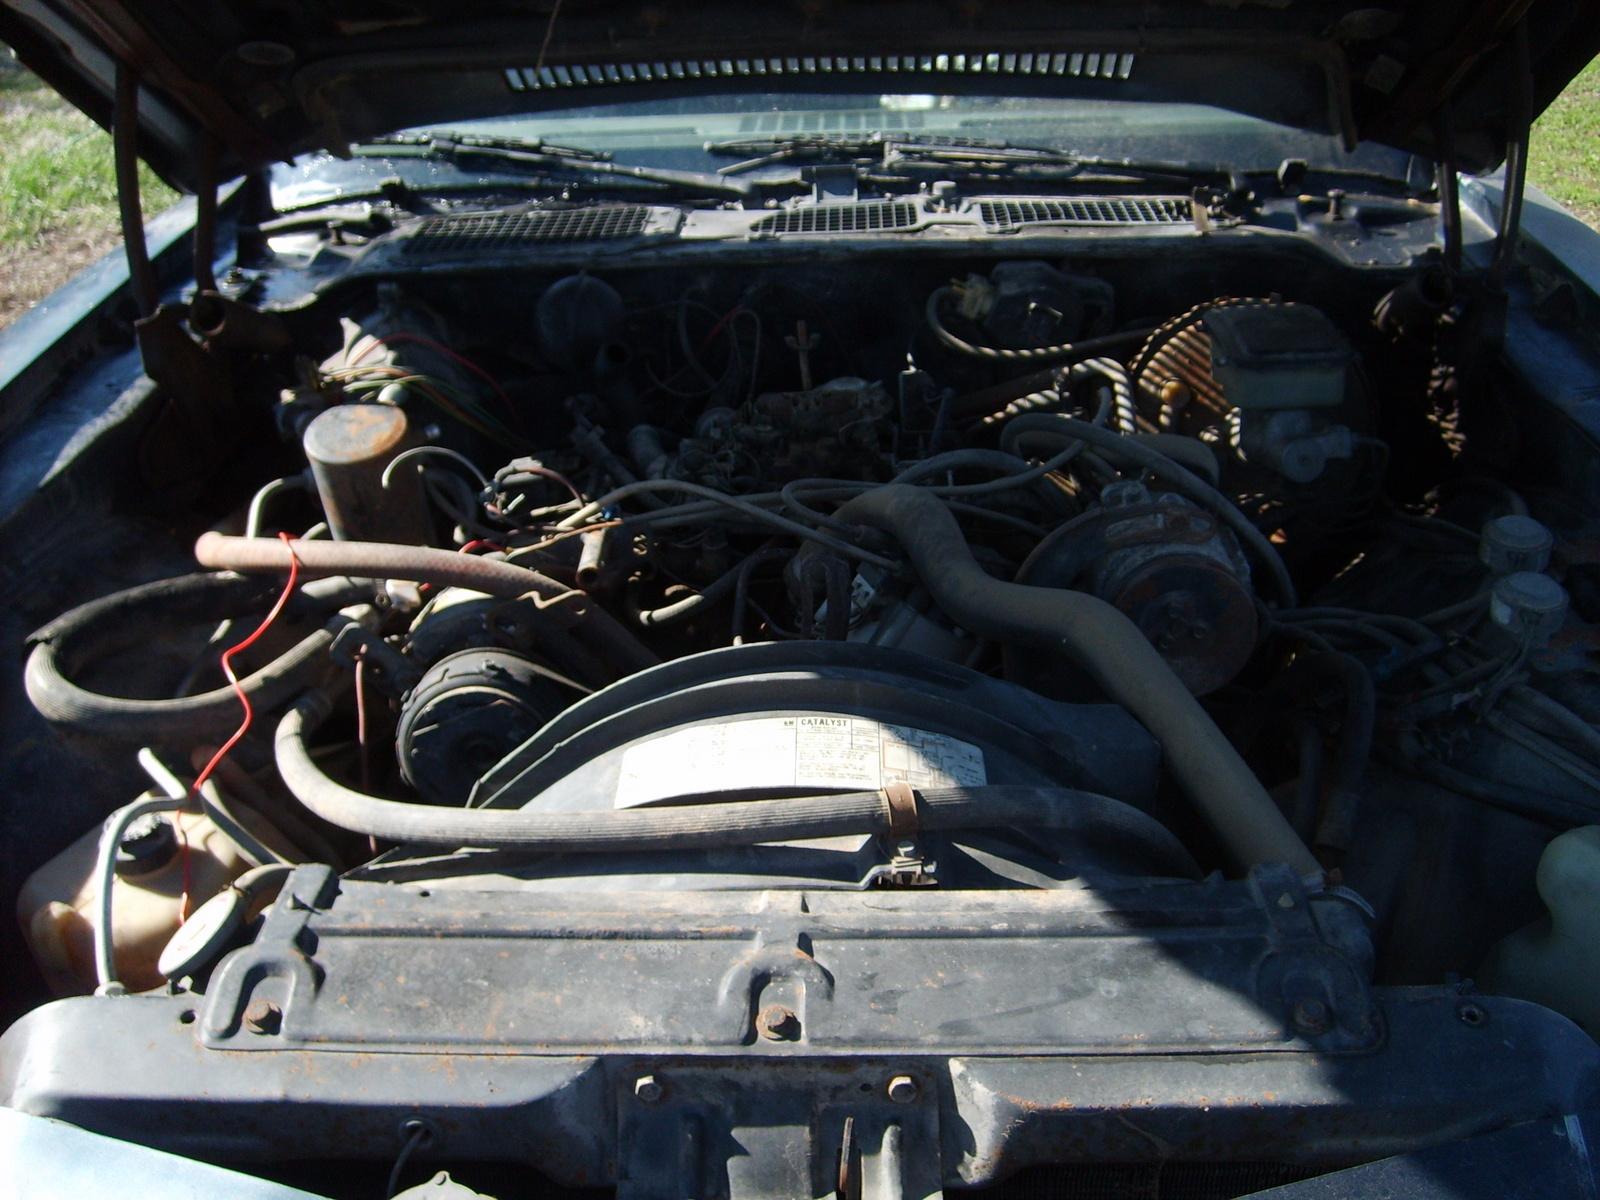 1995 Chevy Camaro 3 4 Sfi V6 Engine And Automatic